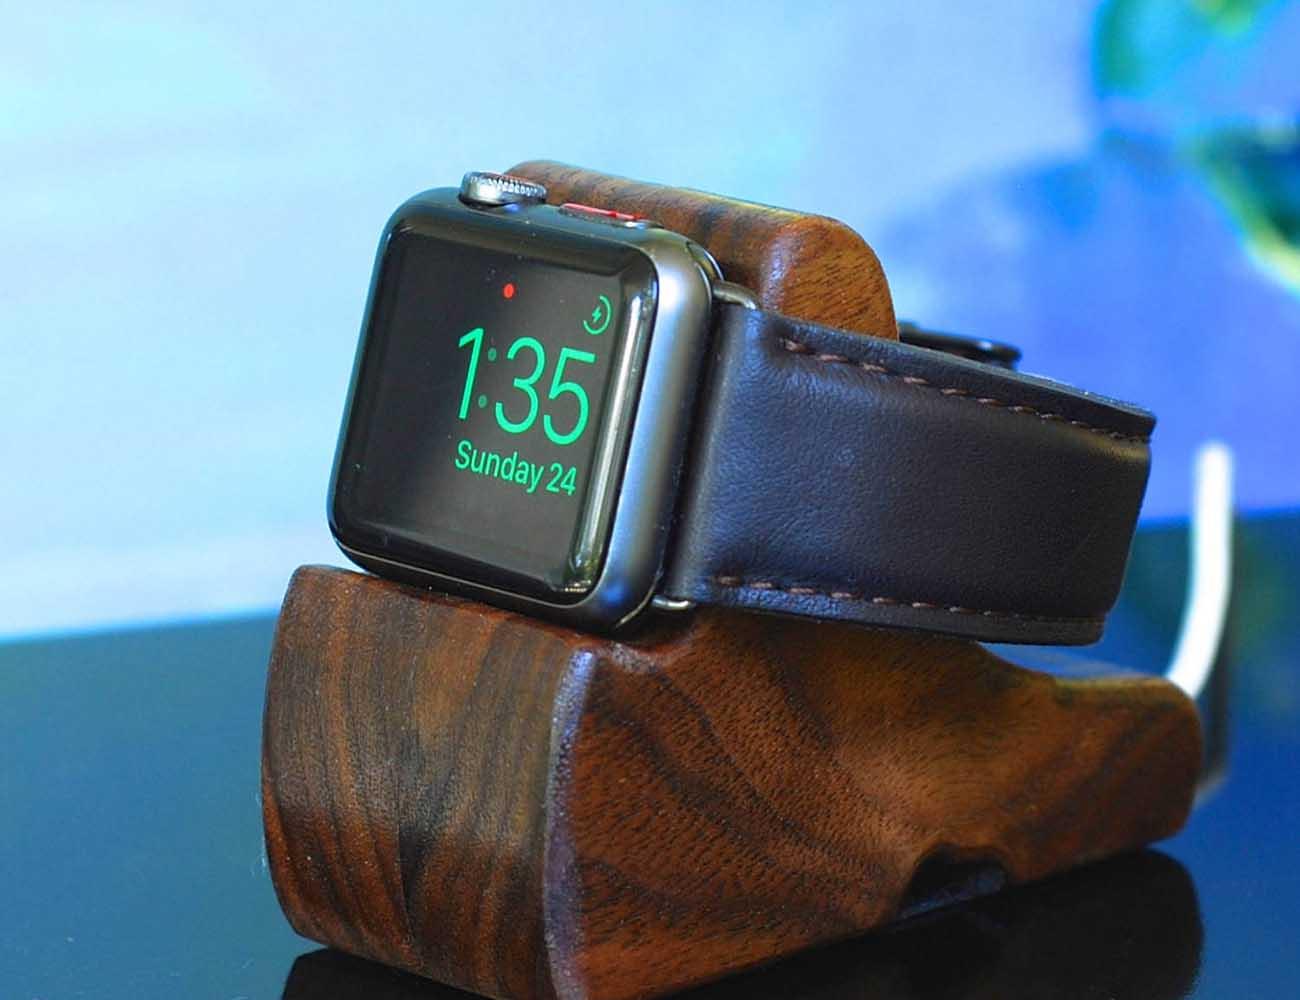 The RIPPLE Apple Watch Stand by SchuttenWorks